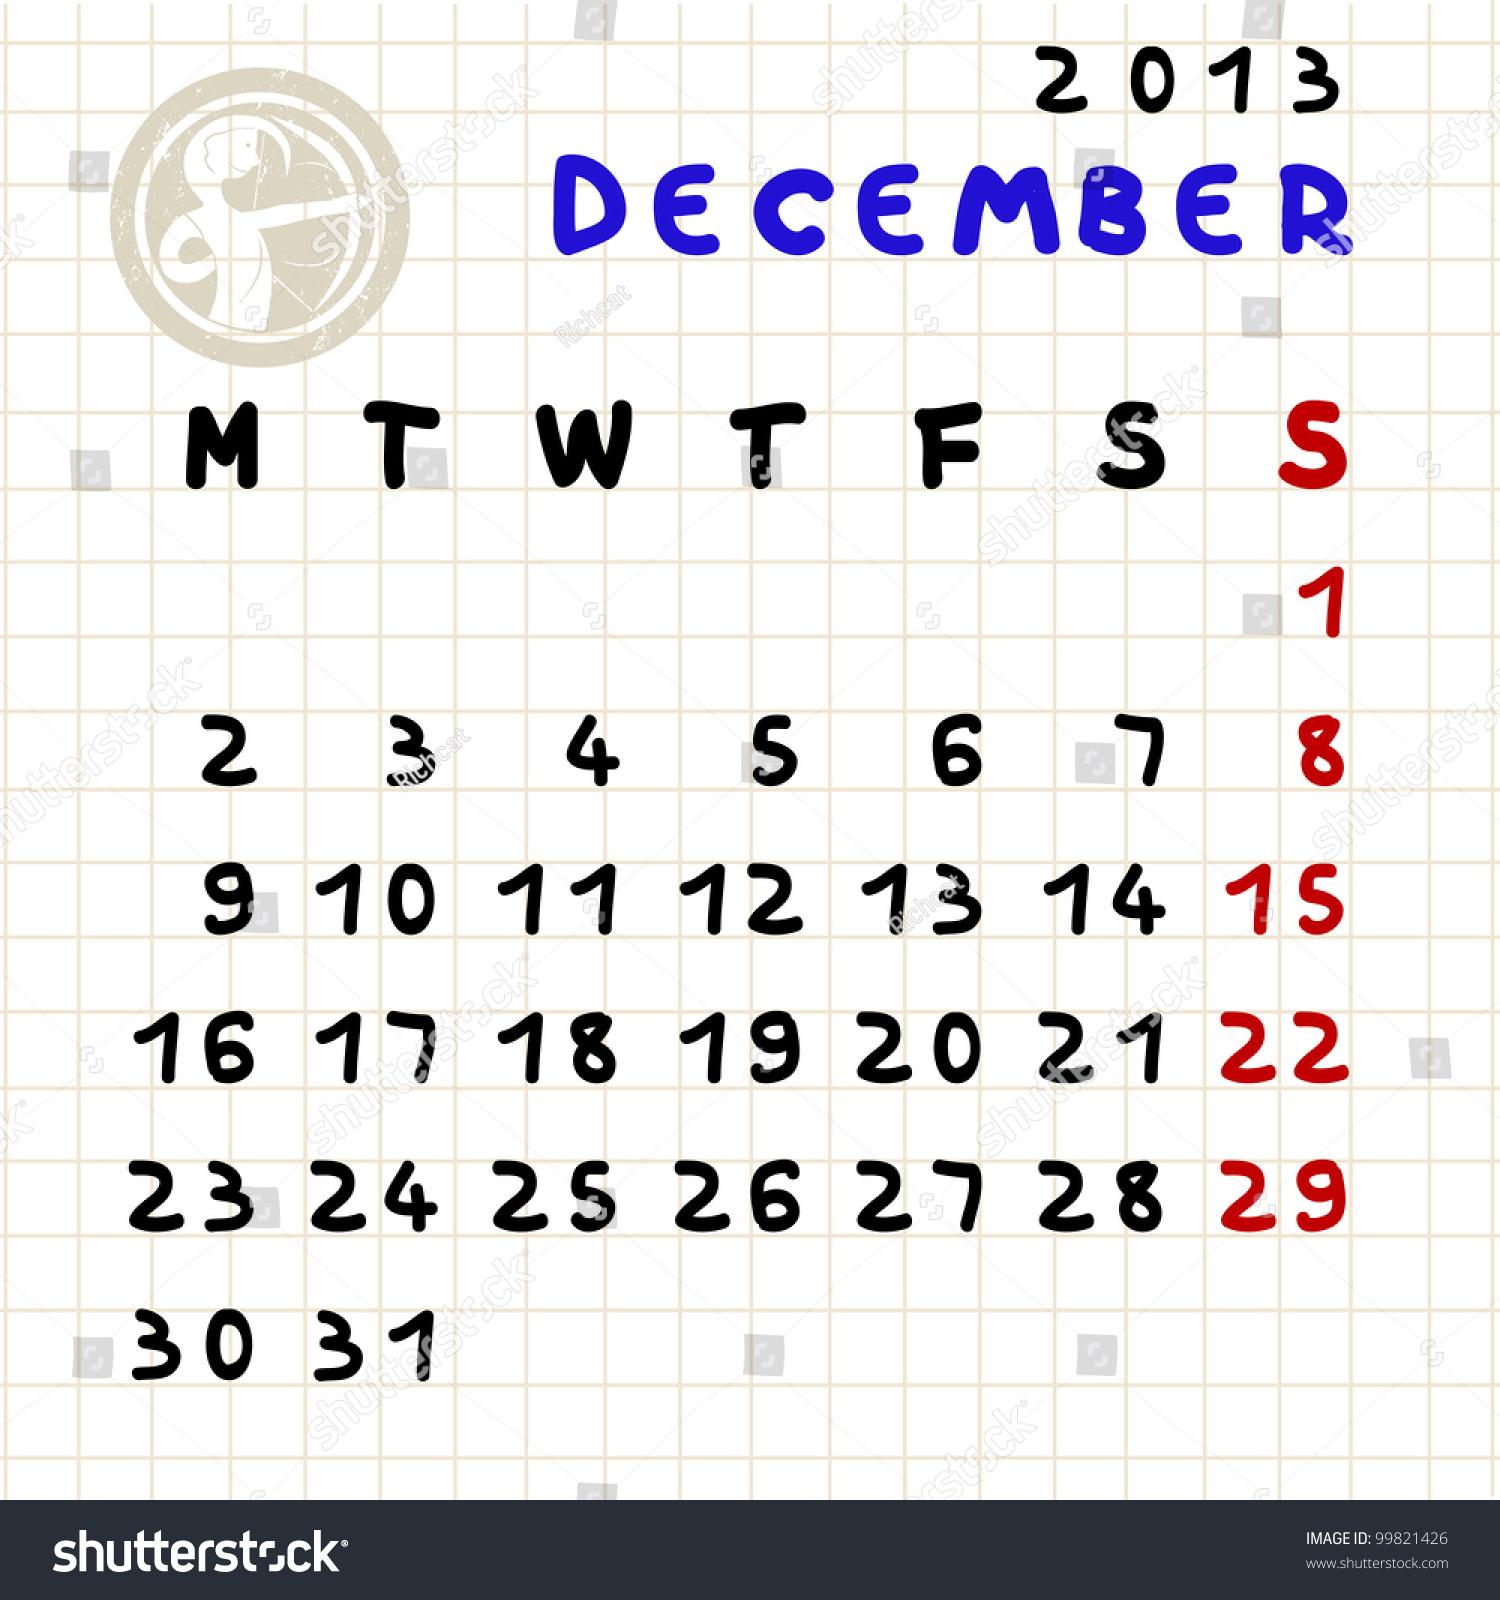 Monthly Calendar Horoscope : Monthly calendar december with sagittarius